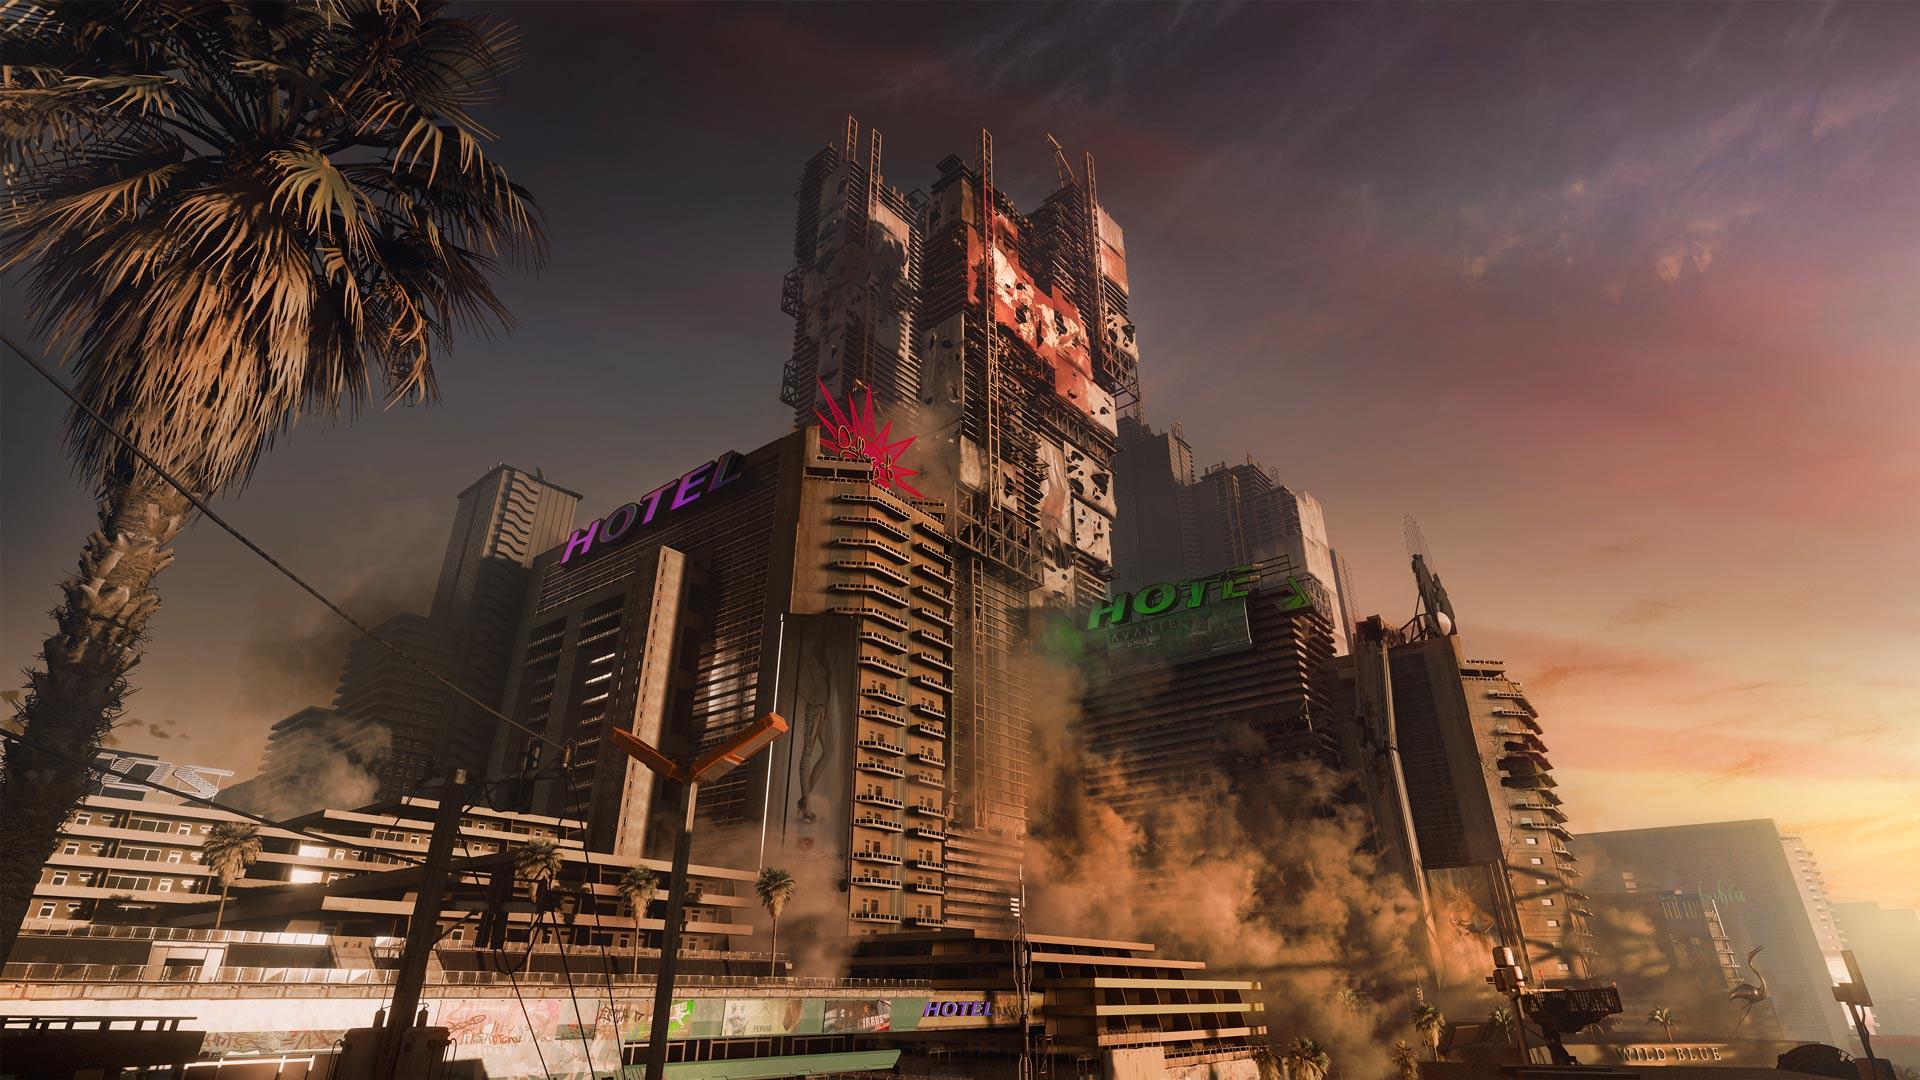 Night City in Cyberpunk 2077